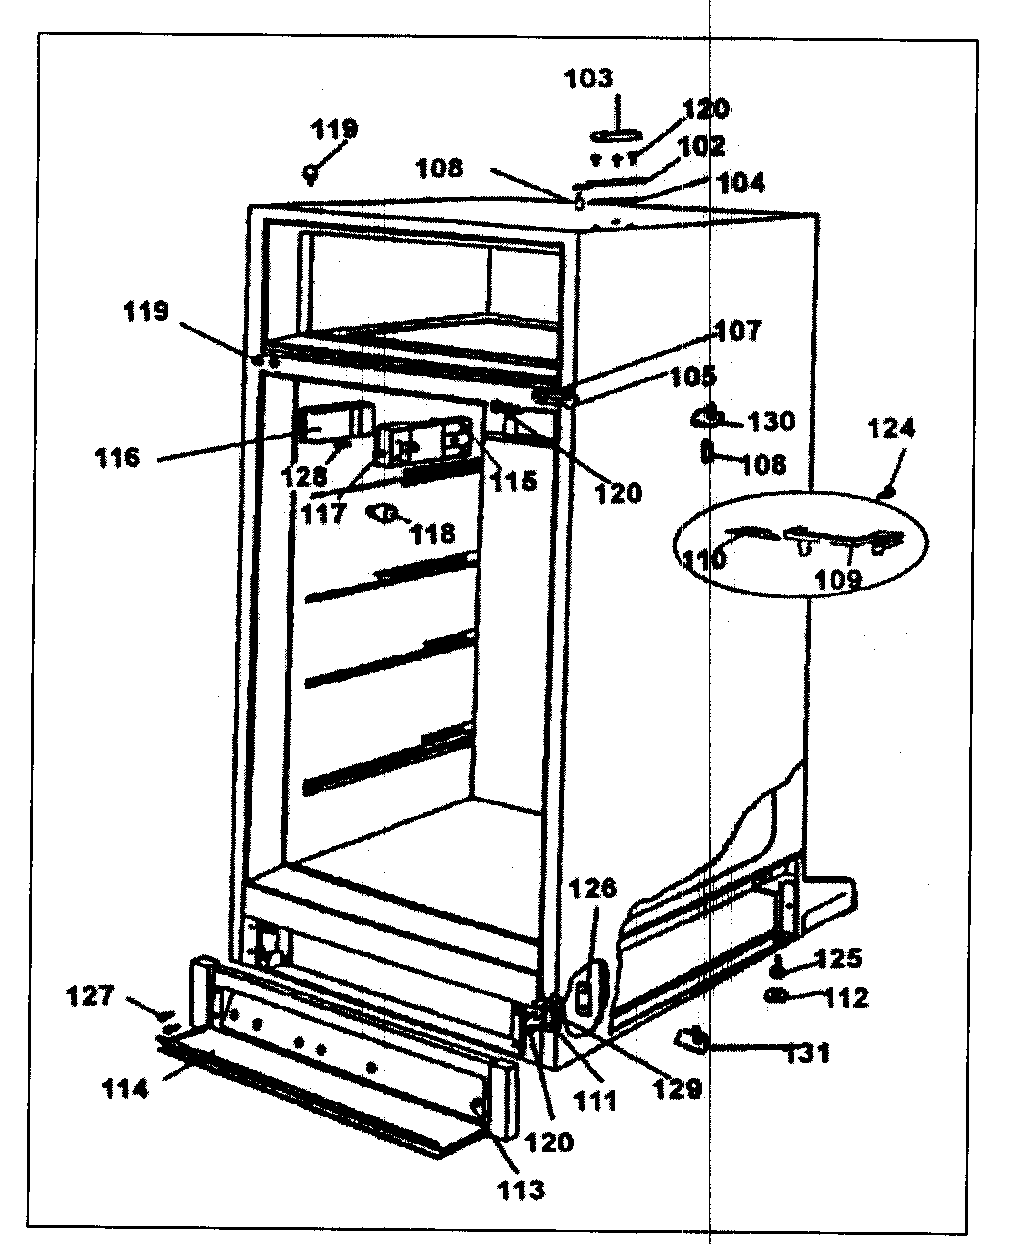 Danby model DPR2260W all refrigerator genuine parts